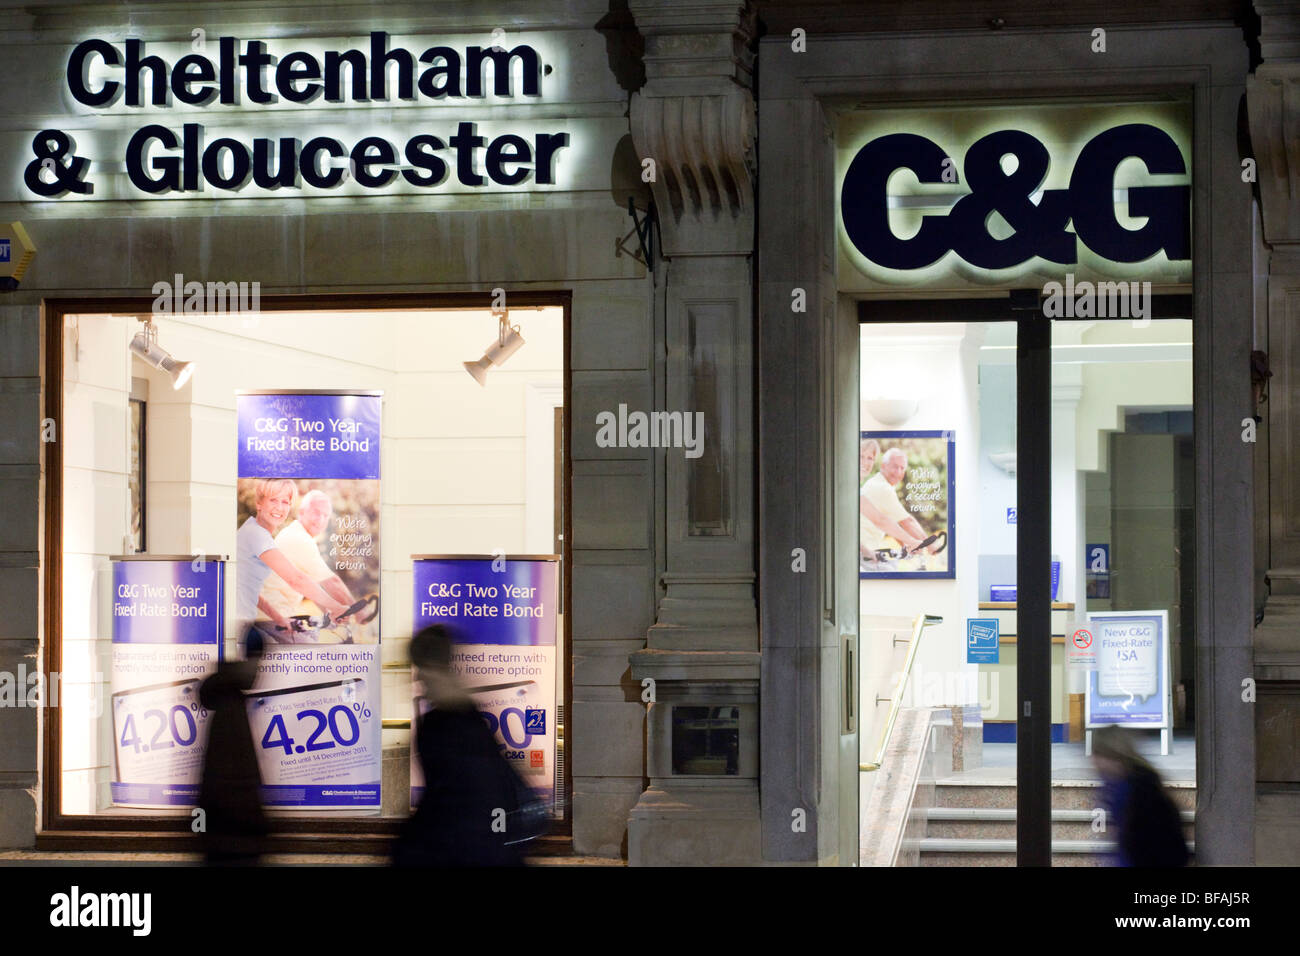 A branch of the Cheltenham & Gloucester Building Society, Gloucester, Gloucestershire UK - Stock Image